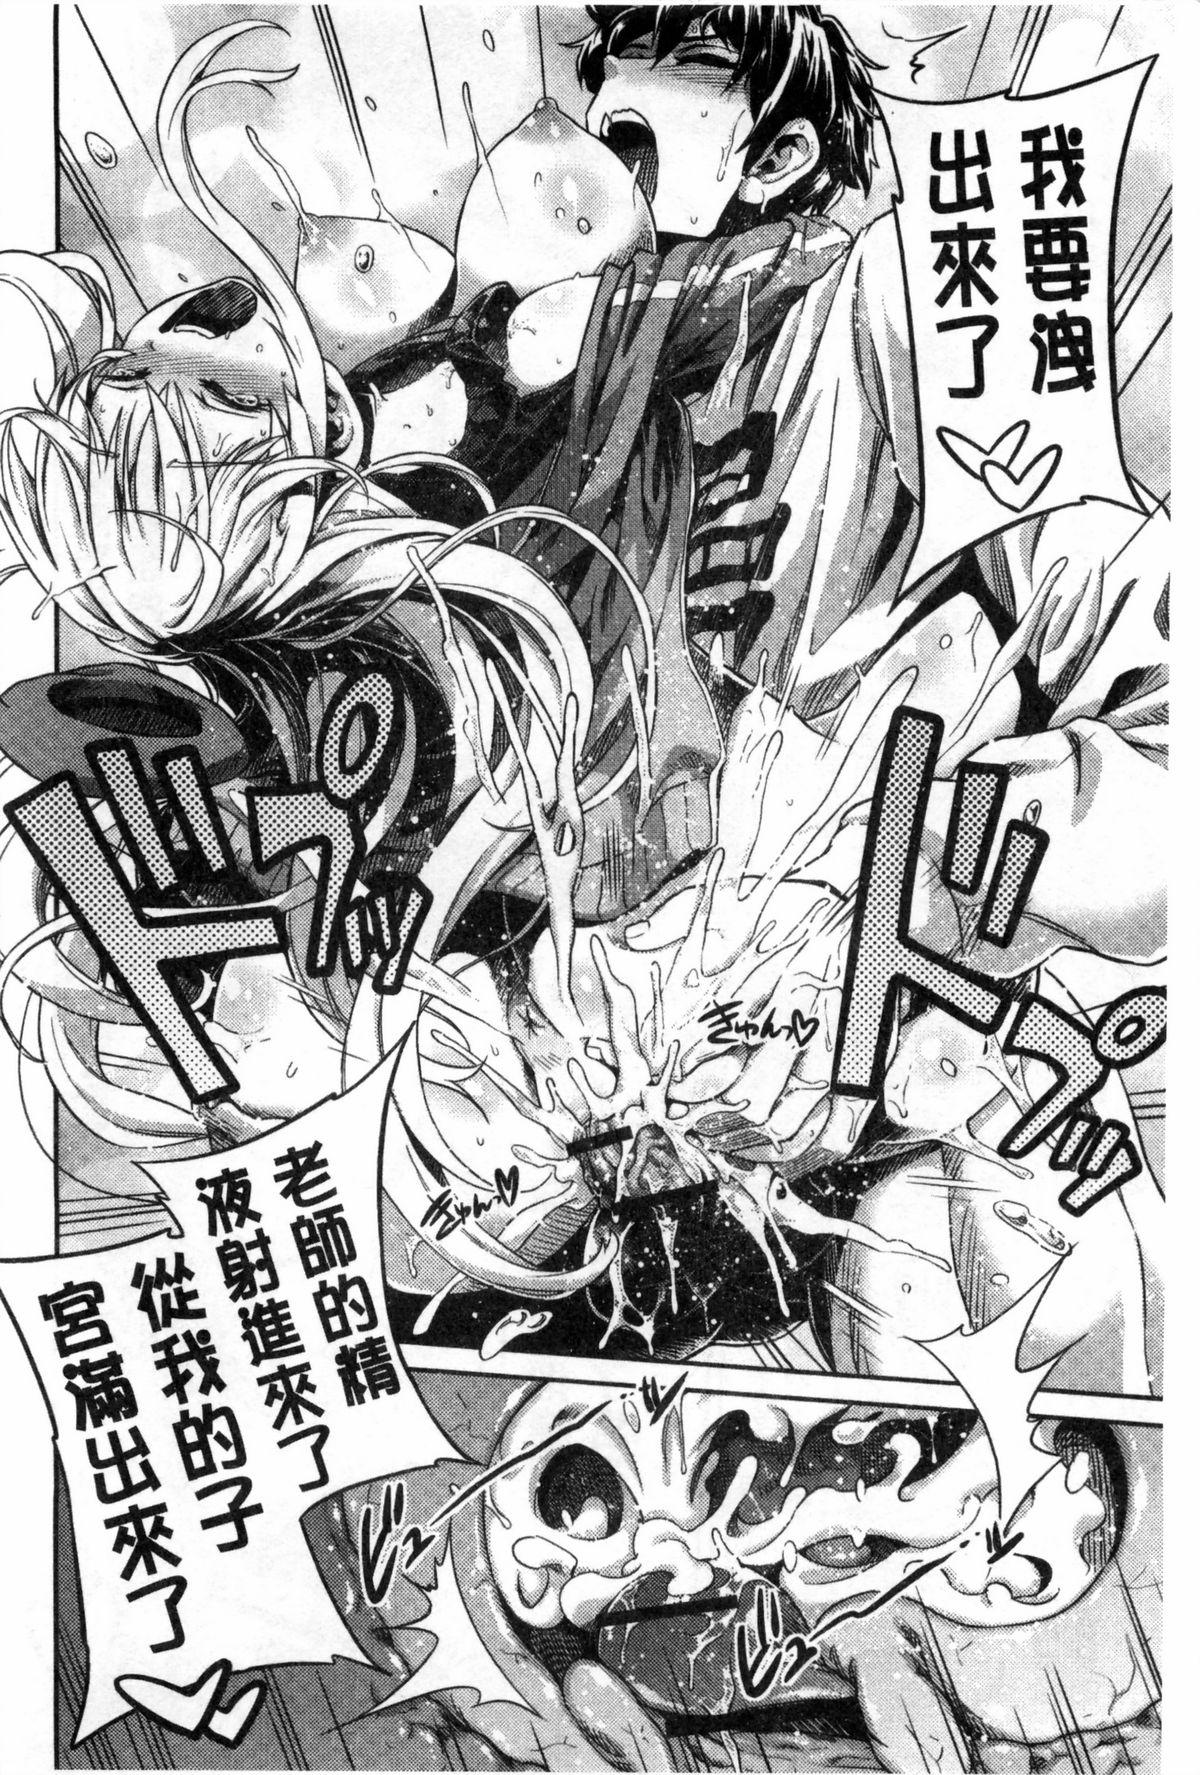 Man x Koi - Ero Manga de Hajimaru Koi no Plot   A漫×戀情 由情色漫畫所萌生的戀之物語 28